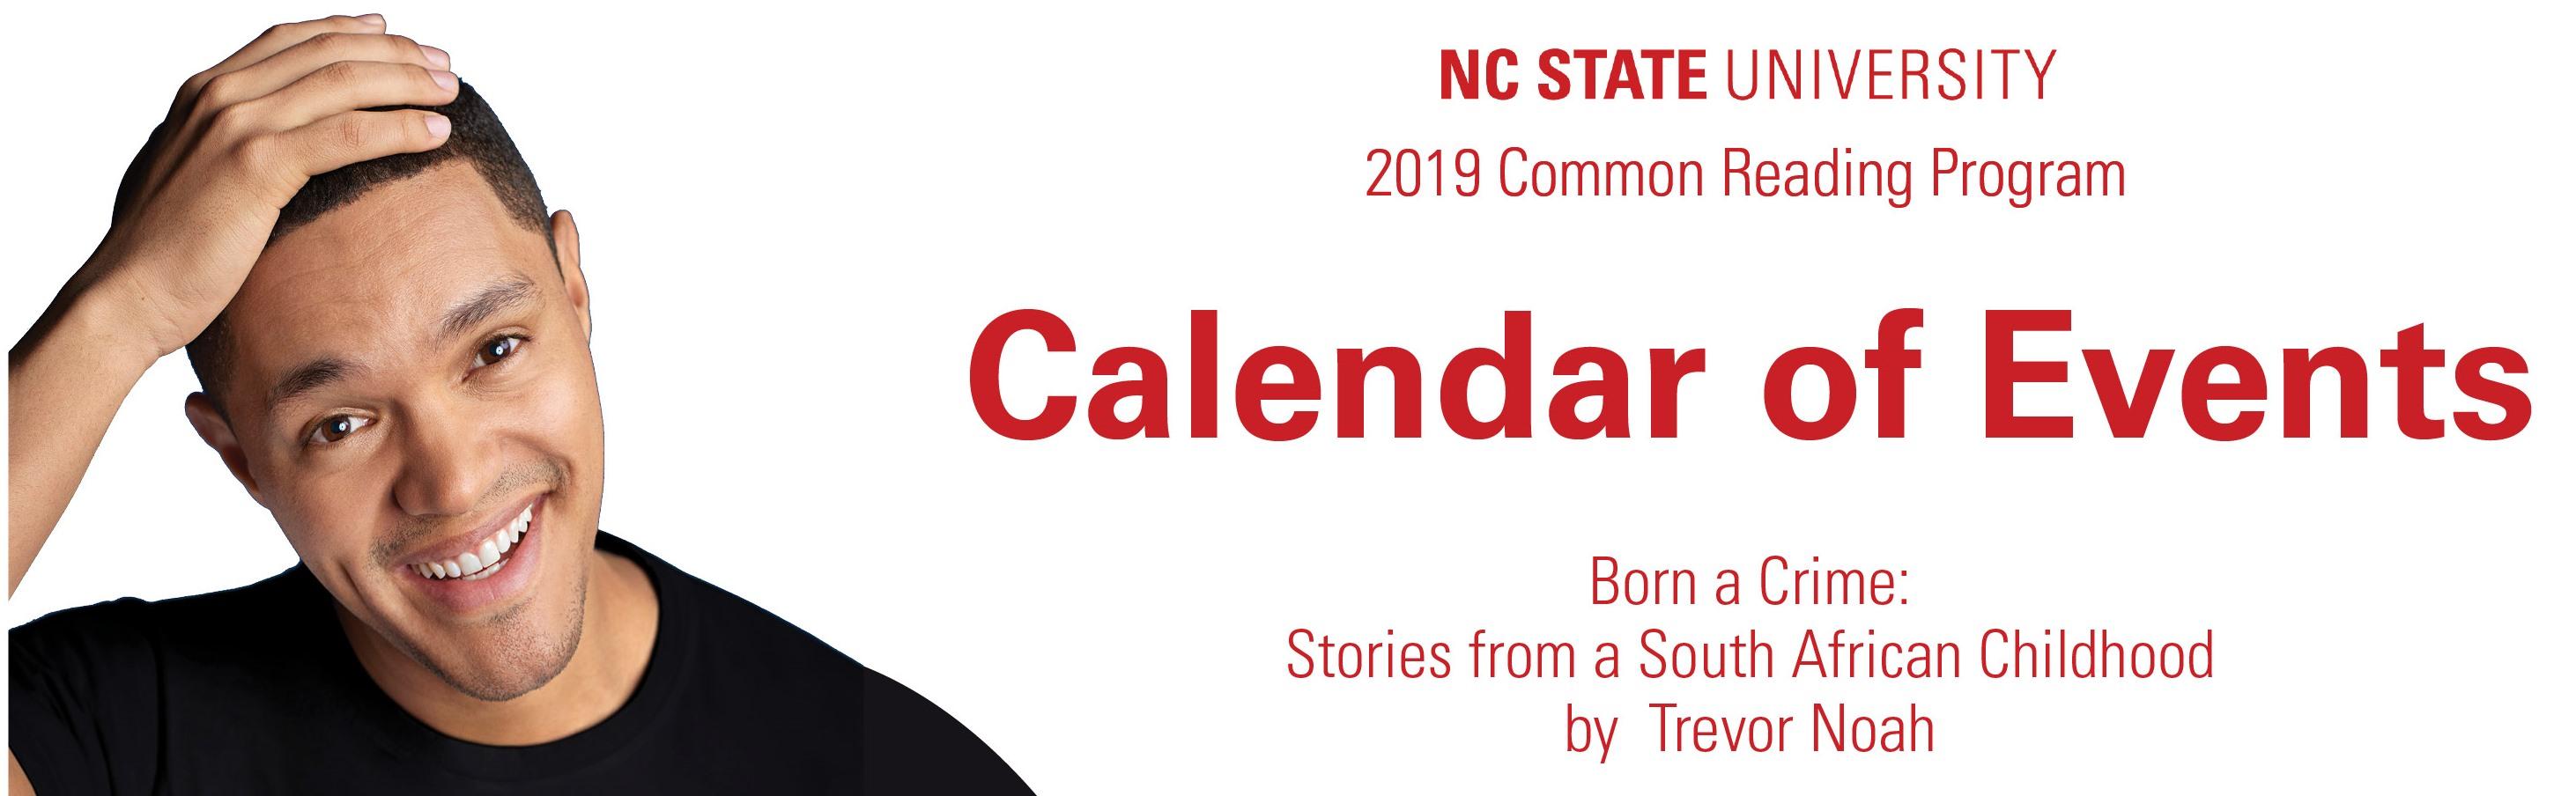 Ncsu Academic Calendar 2020 Calendar of Events   New Student Programs